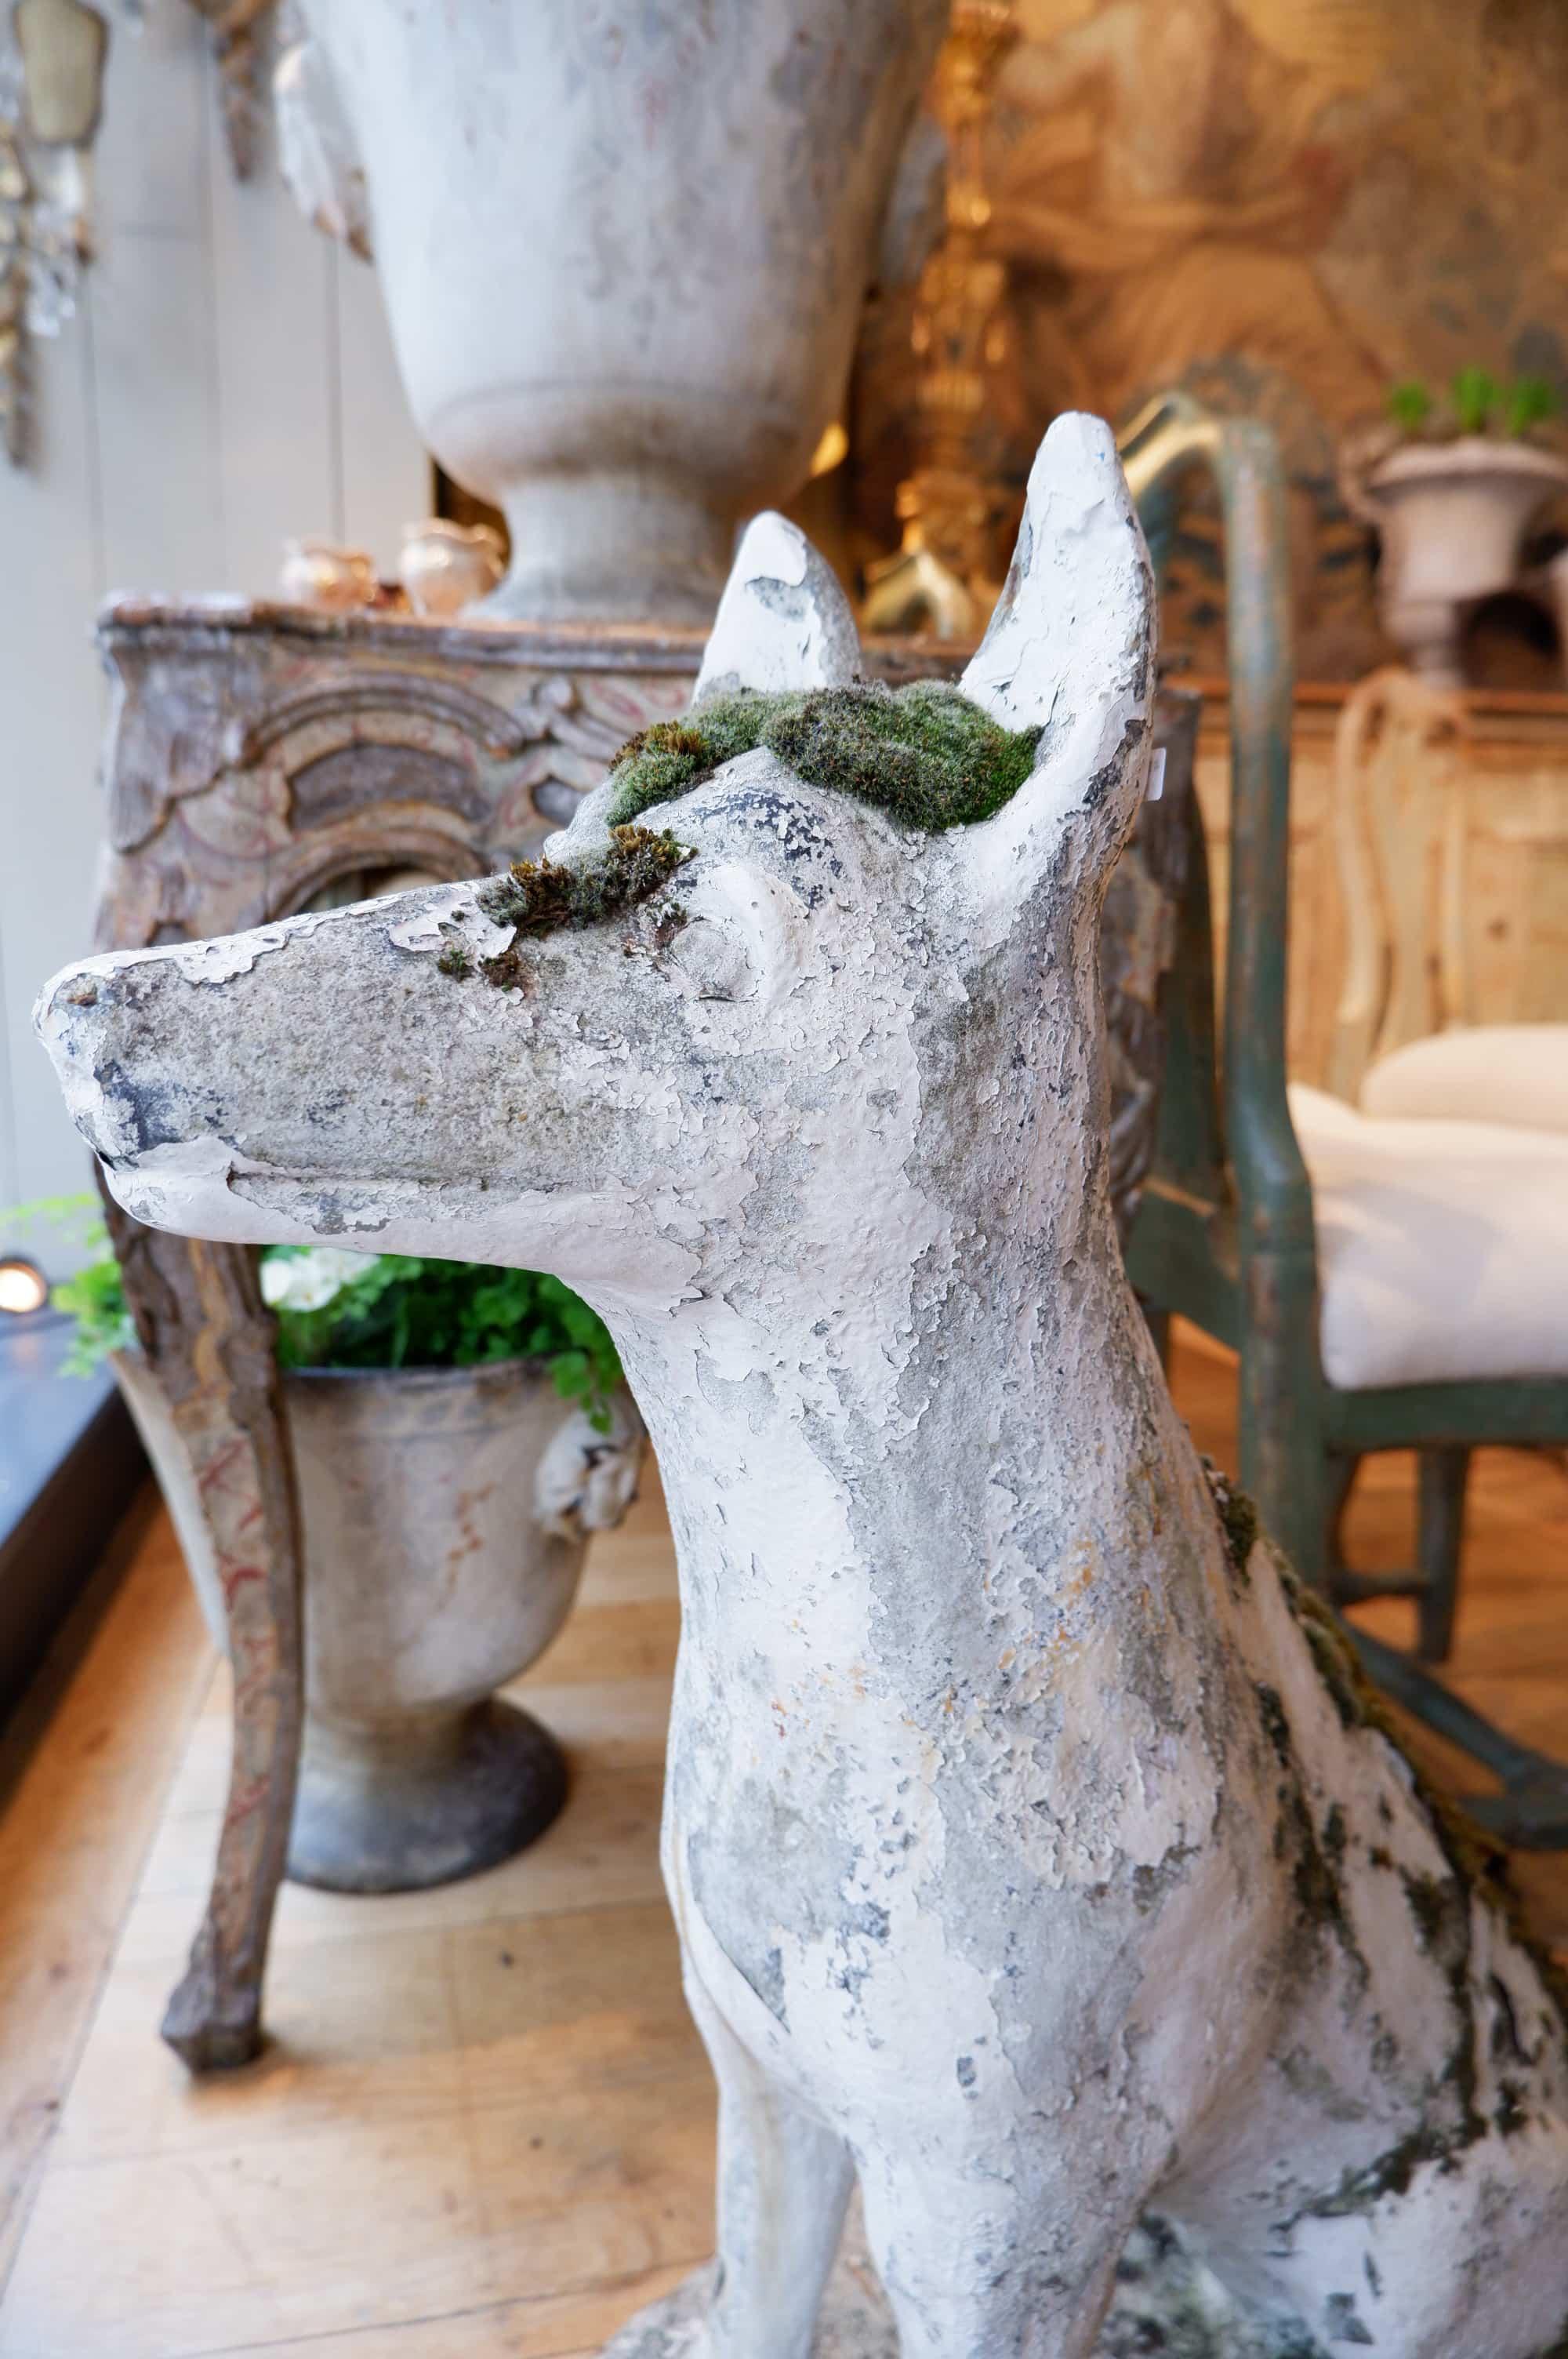 Chien en pierre reconstituée – Ornement de jardin ca.1900